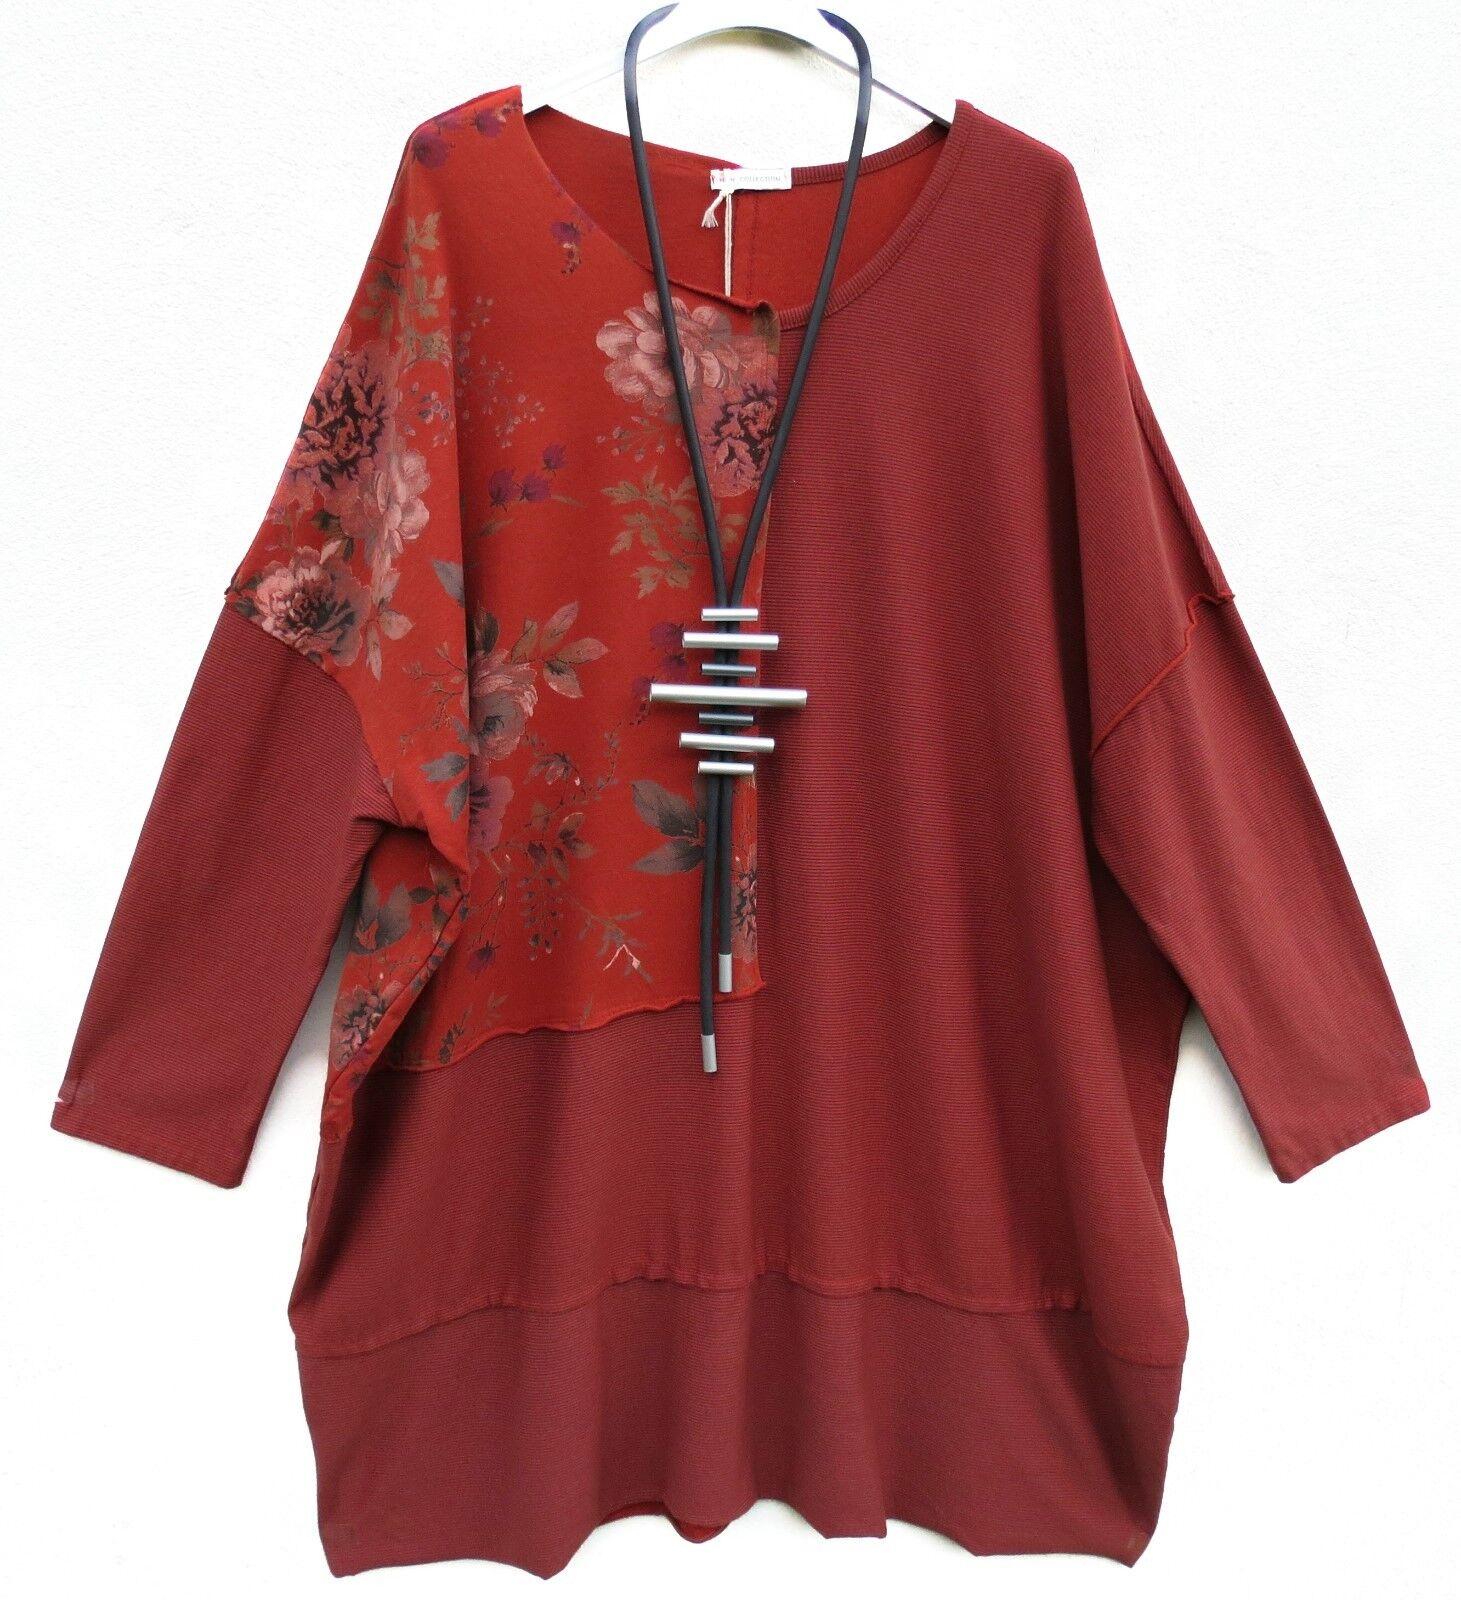 New Collection Kleid lange Tunika Dress Robe Vestido XXXL 56 Lagenlook